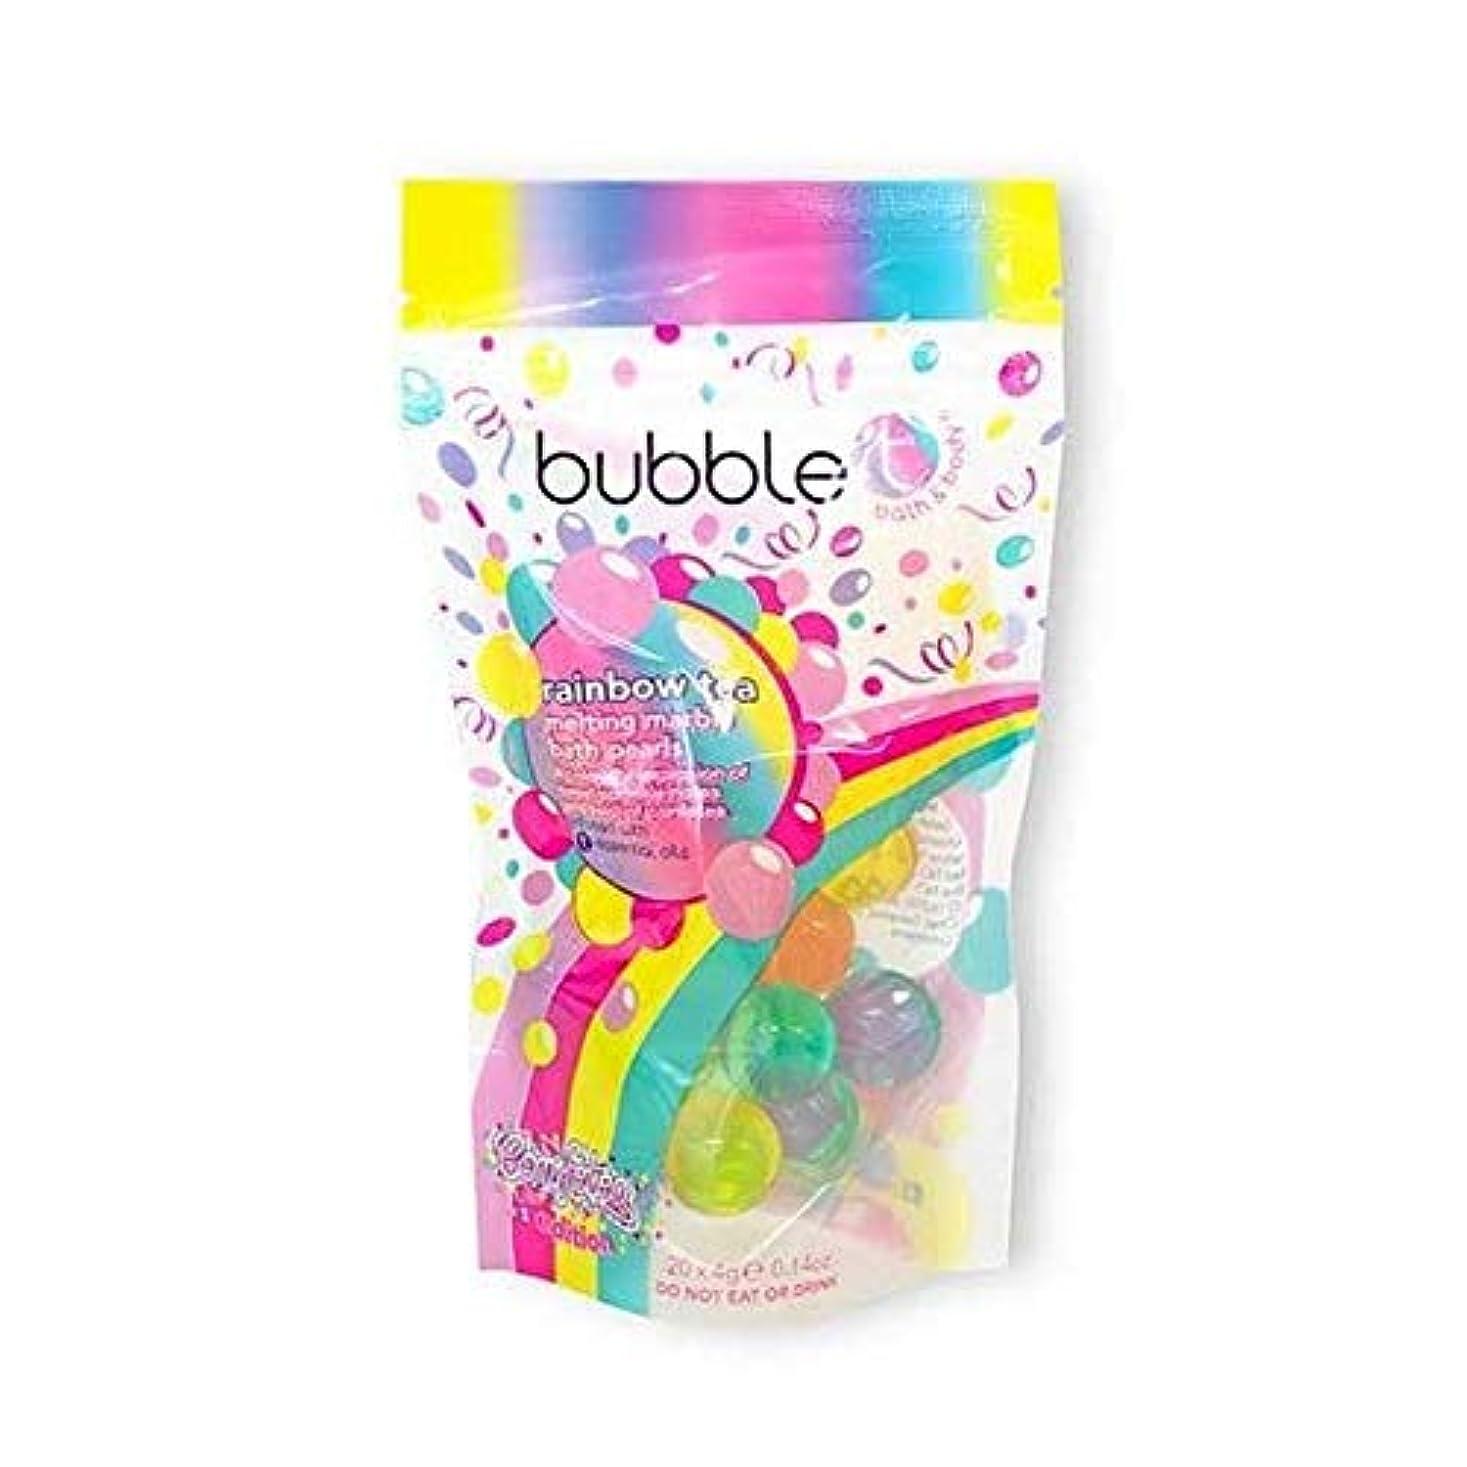 [Bubble T ] バブルトン化粧品溶融槽真珠虹茶20×4グラム - Bubble T Cosmetics Melting Bath Pearls Rainbow Tea 20 x 4g [並行輸入品]